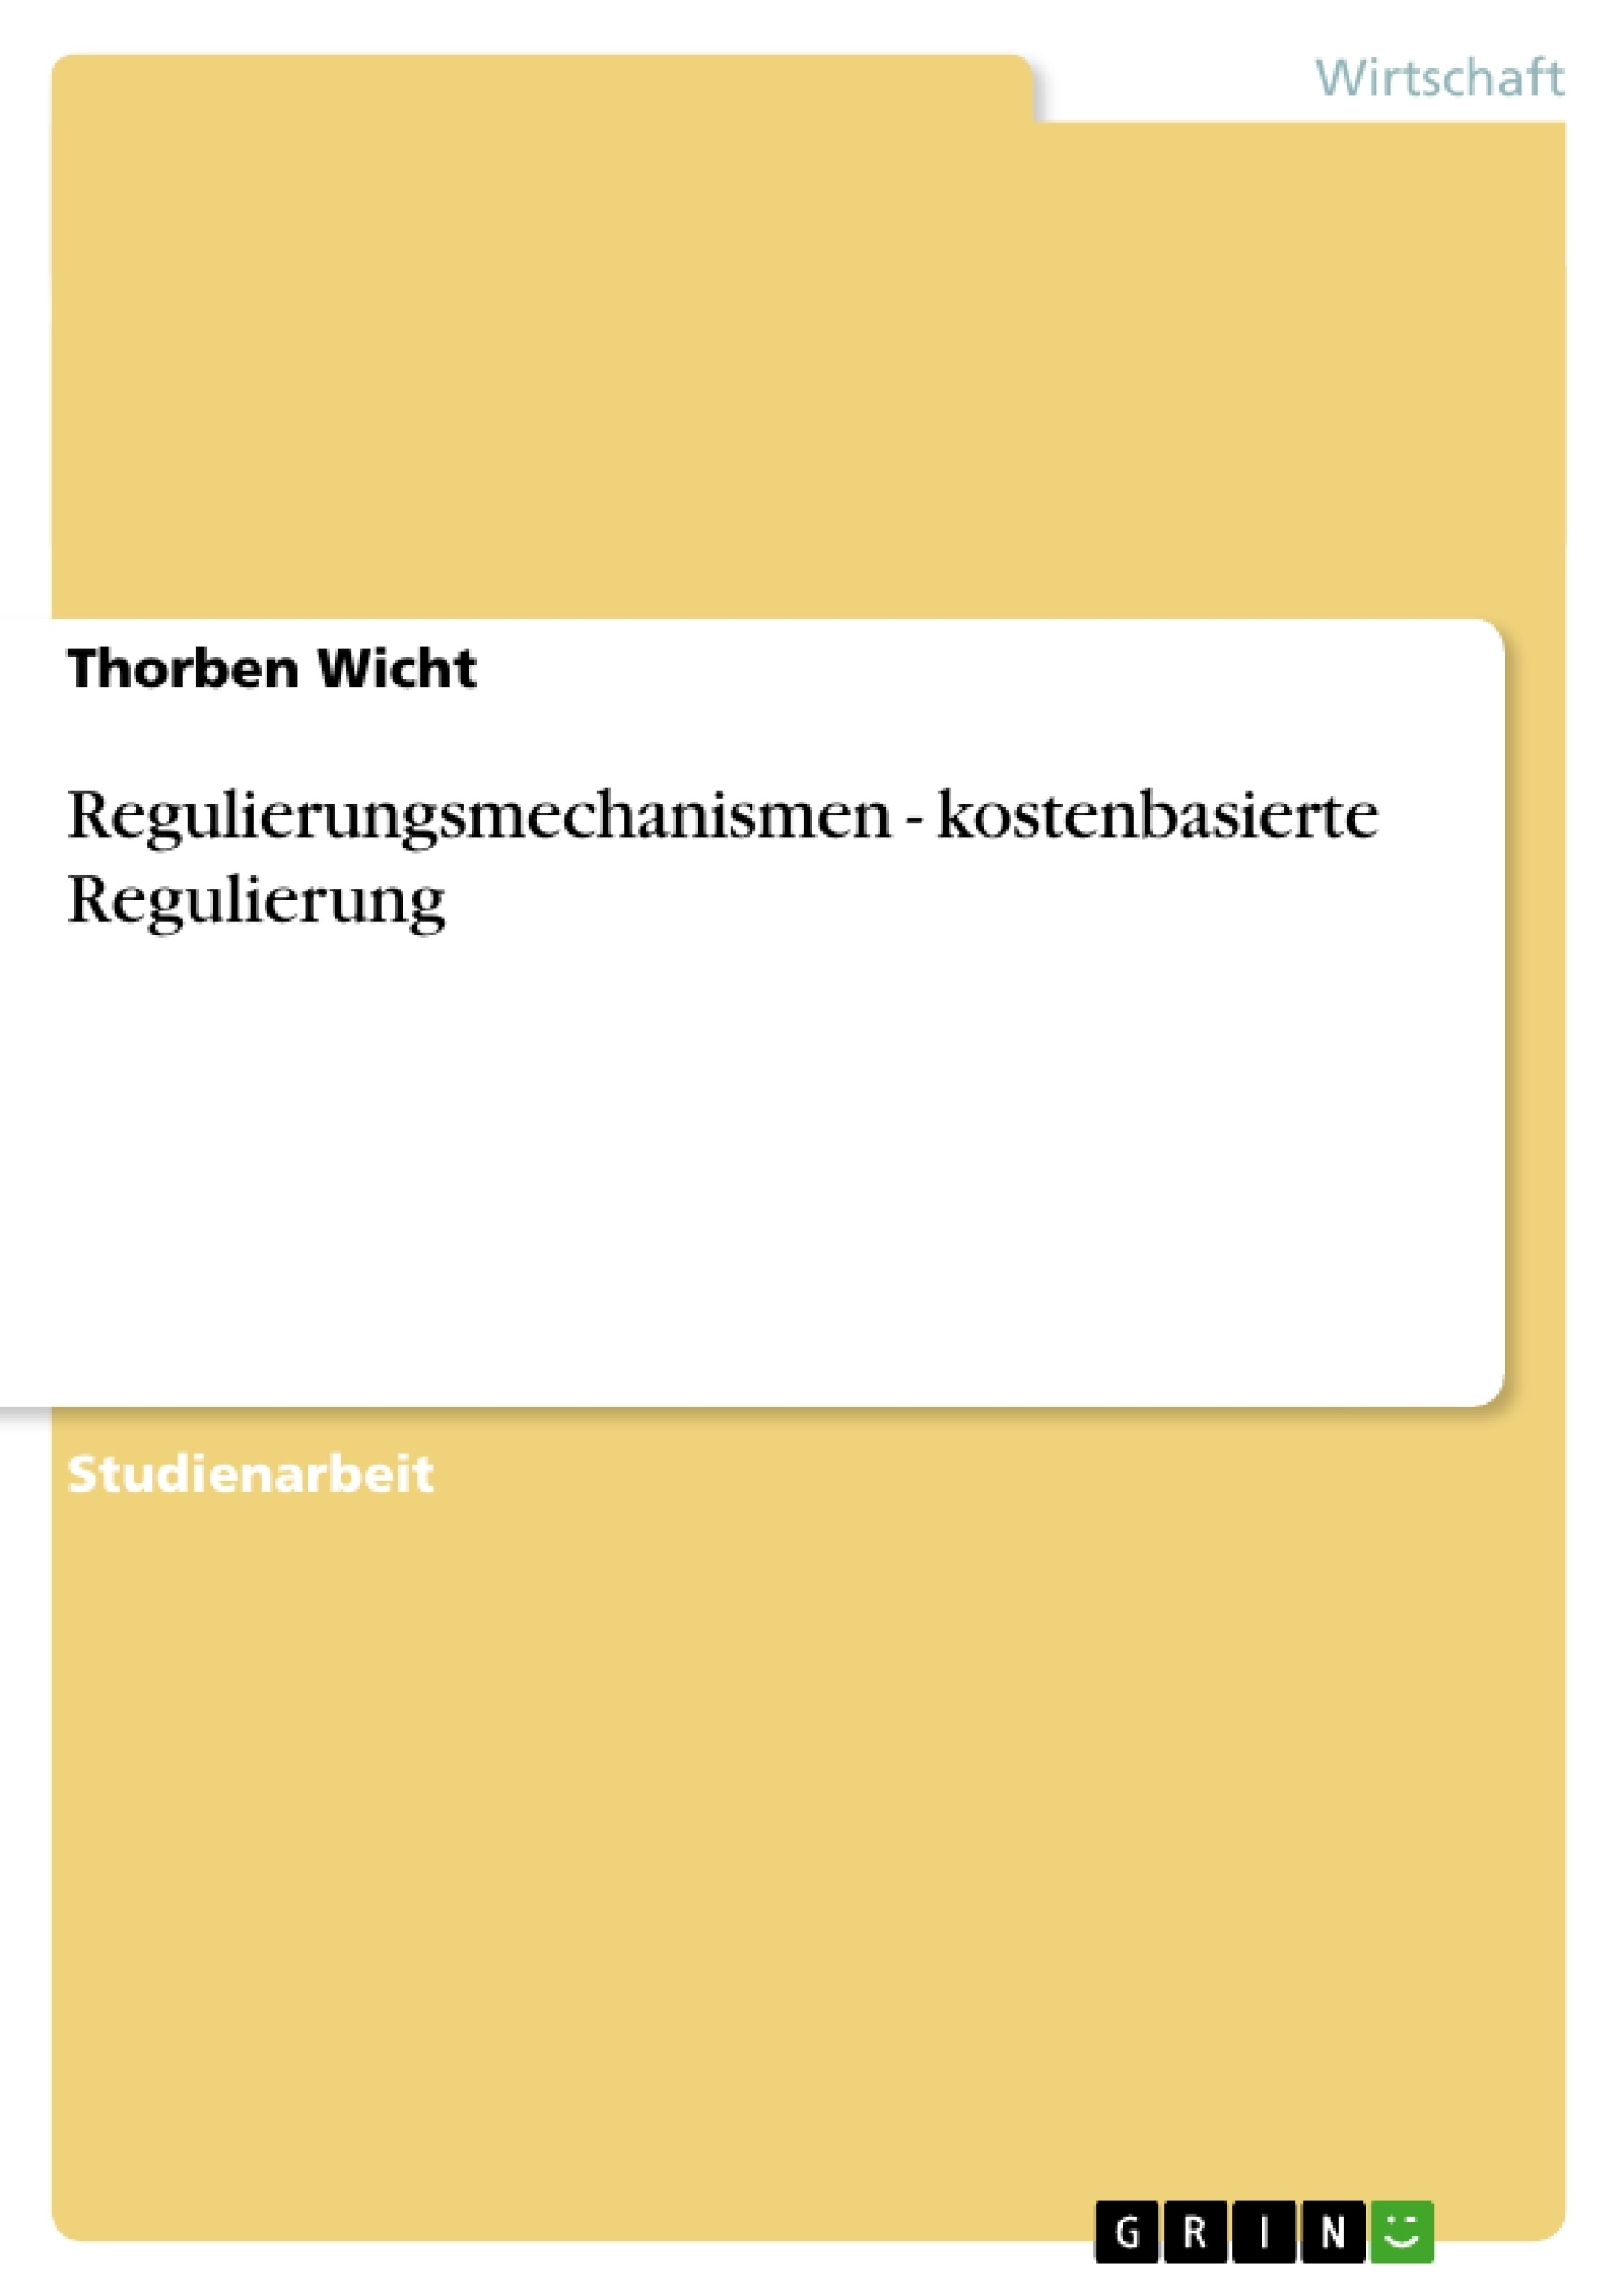 Titel: Regulierungsmechanismen - kostenbasierte Regulierung